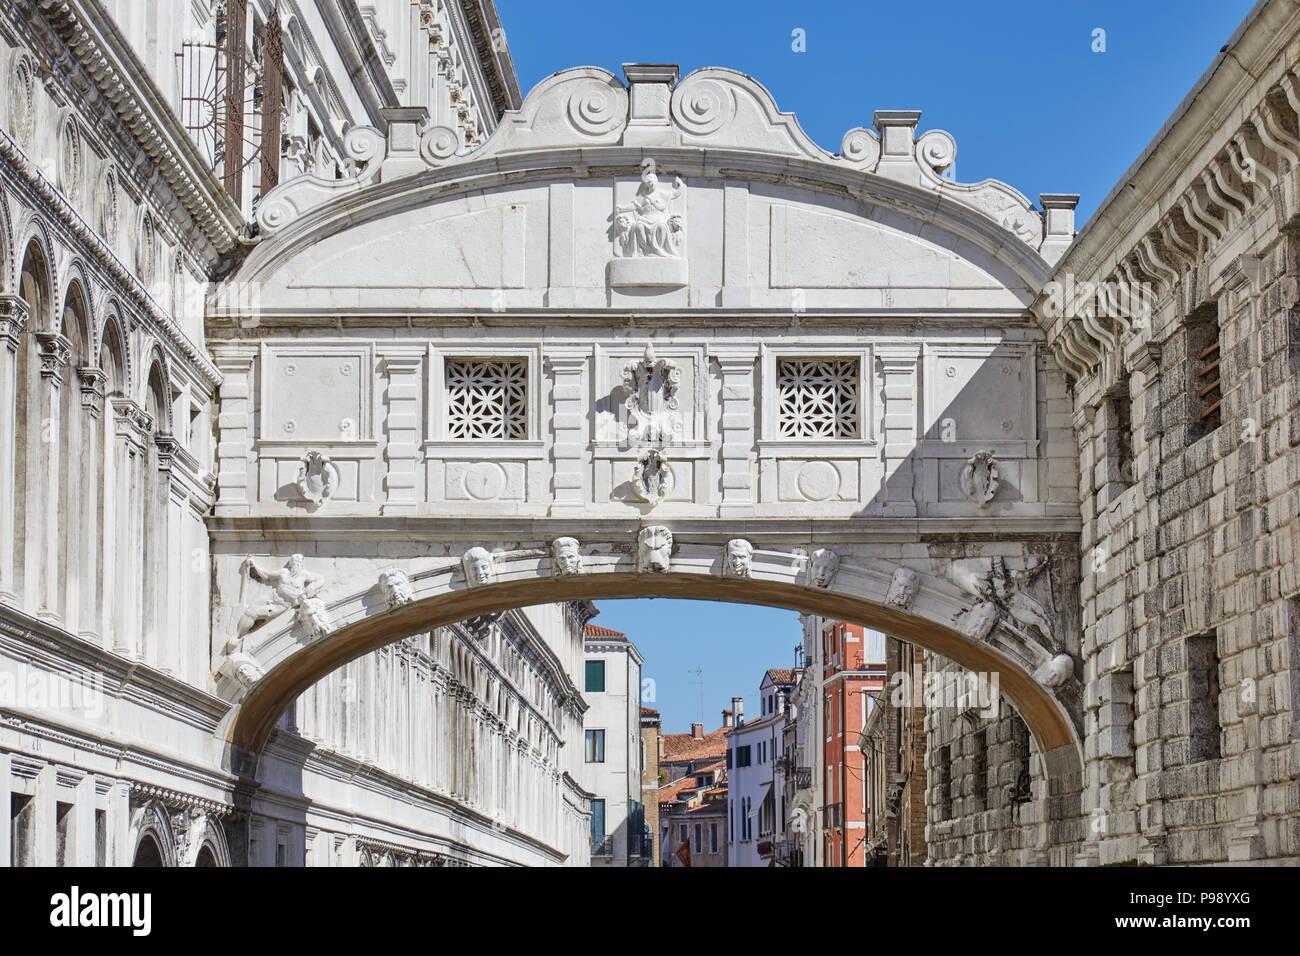 Seufzerbrücke in Venedig, blauer Himmel an einem sonnigen Tag in Italien Stockbild